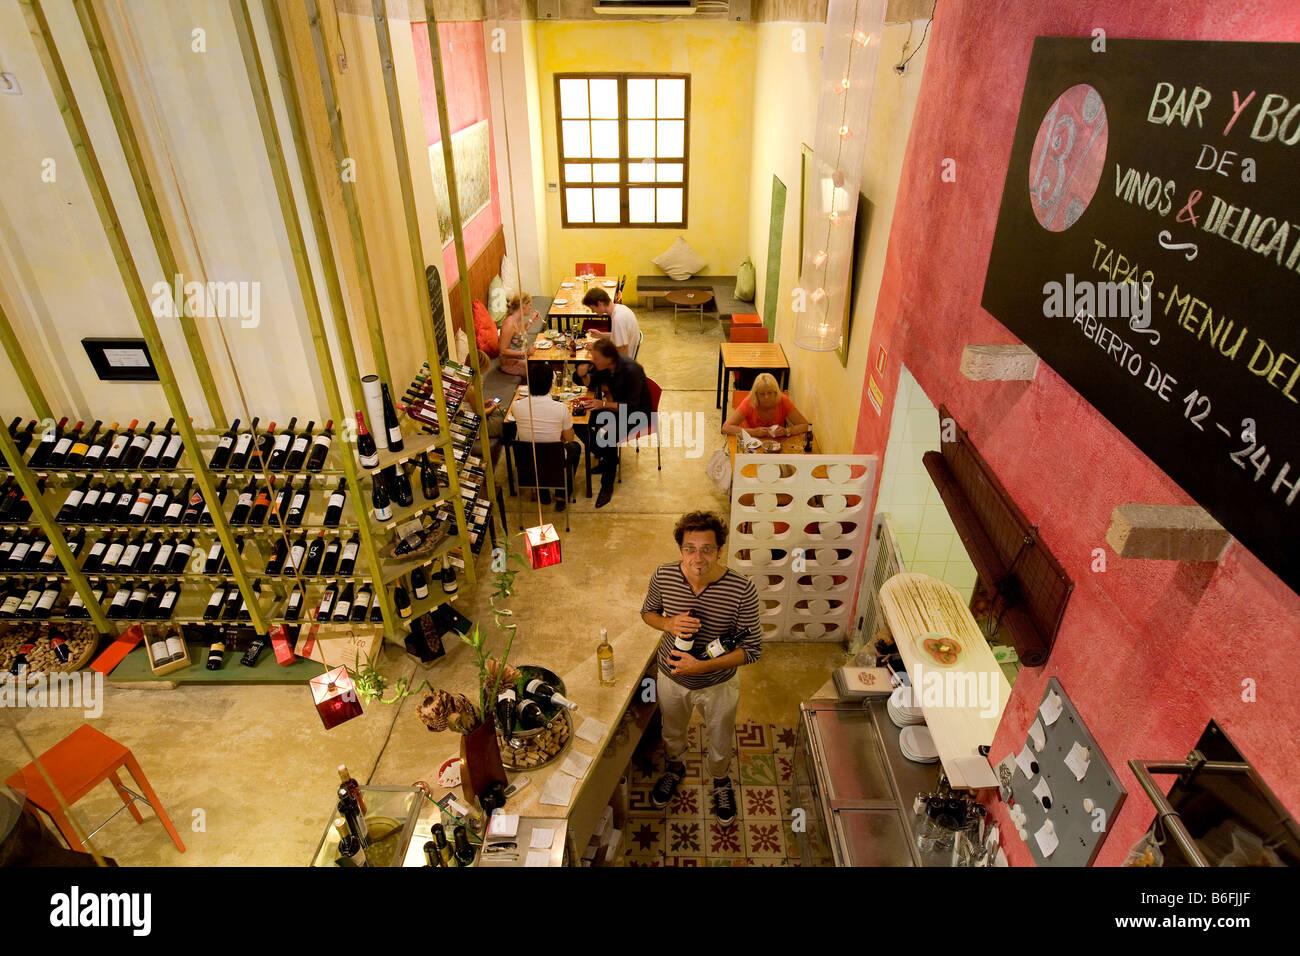 Wine bar 13%, owner Miguel Bolik, Palma de Mallorca, Majorca Stock ...